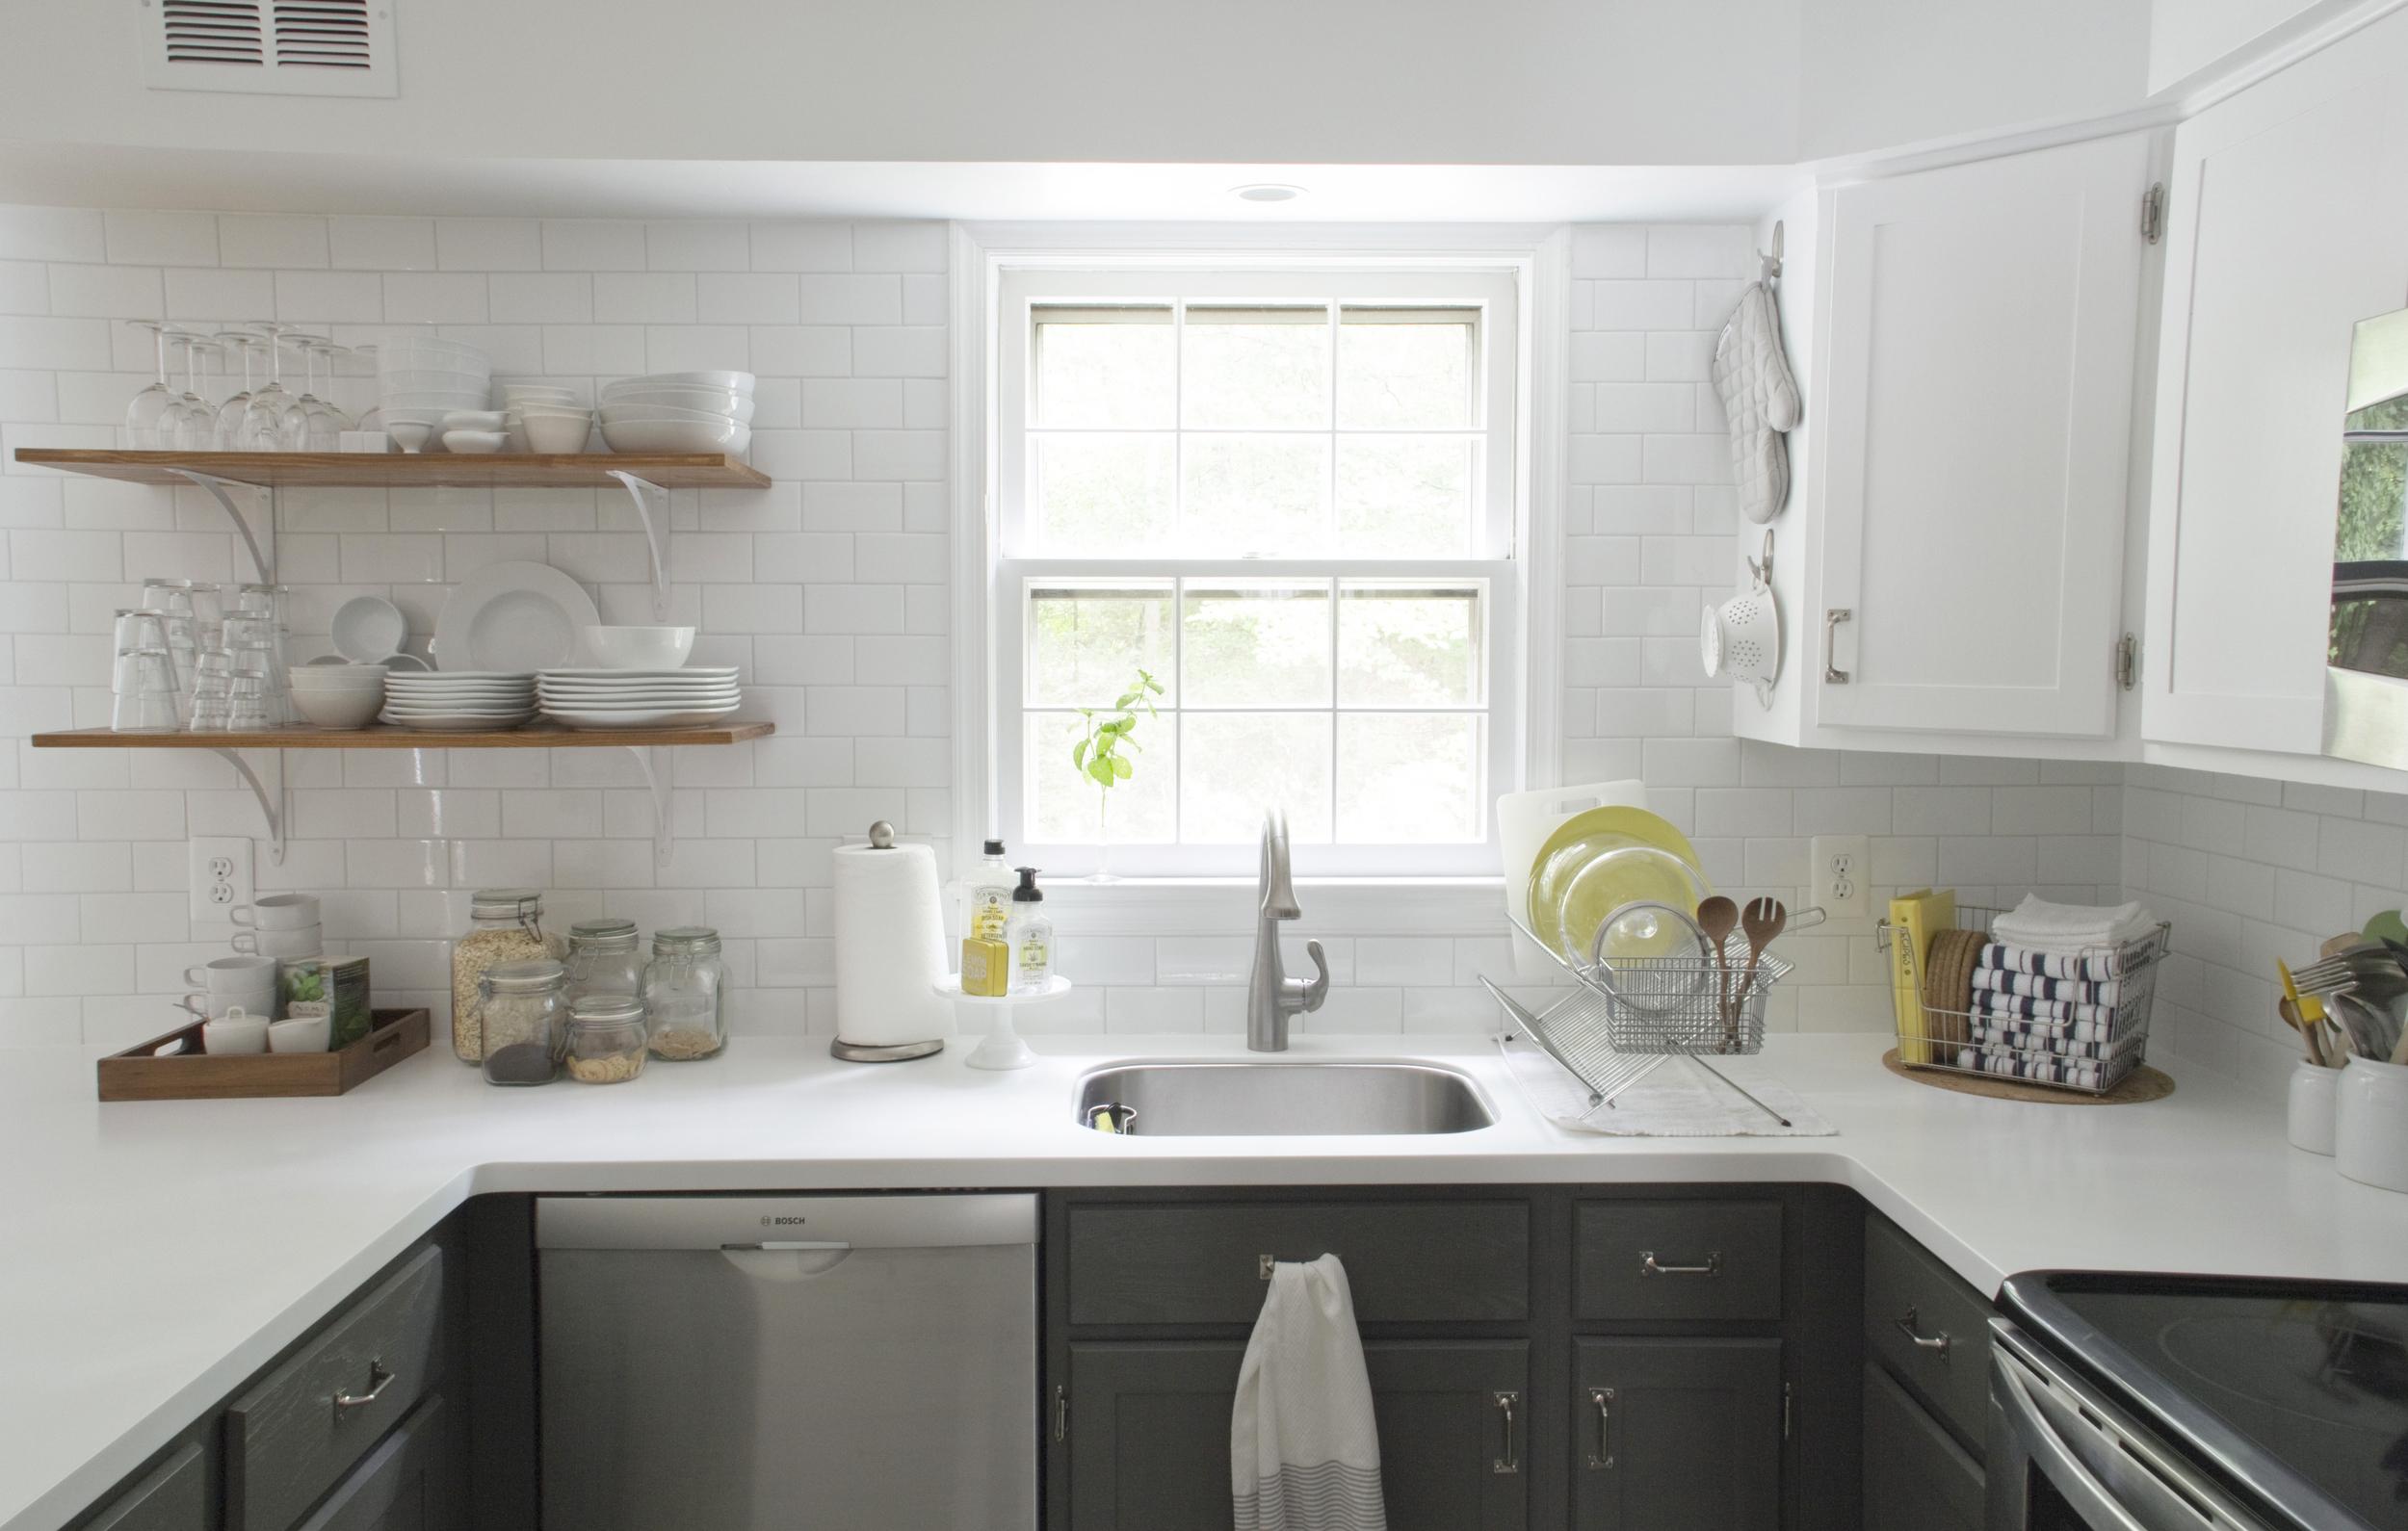 KitchenRemodel_Sink_CC1.jpg